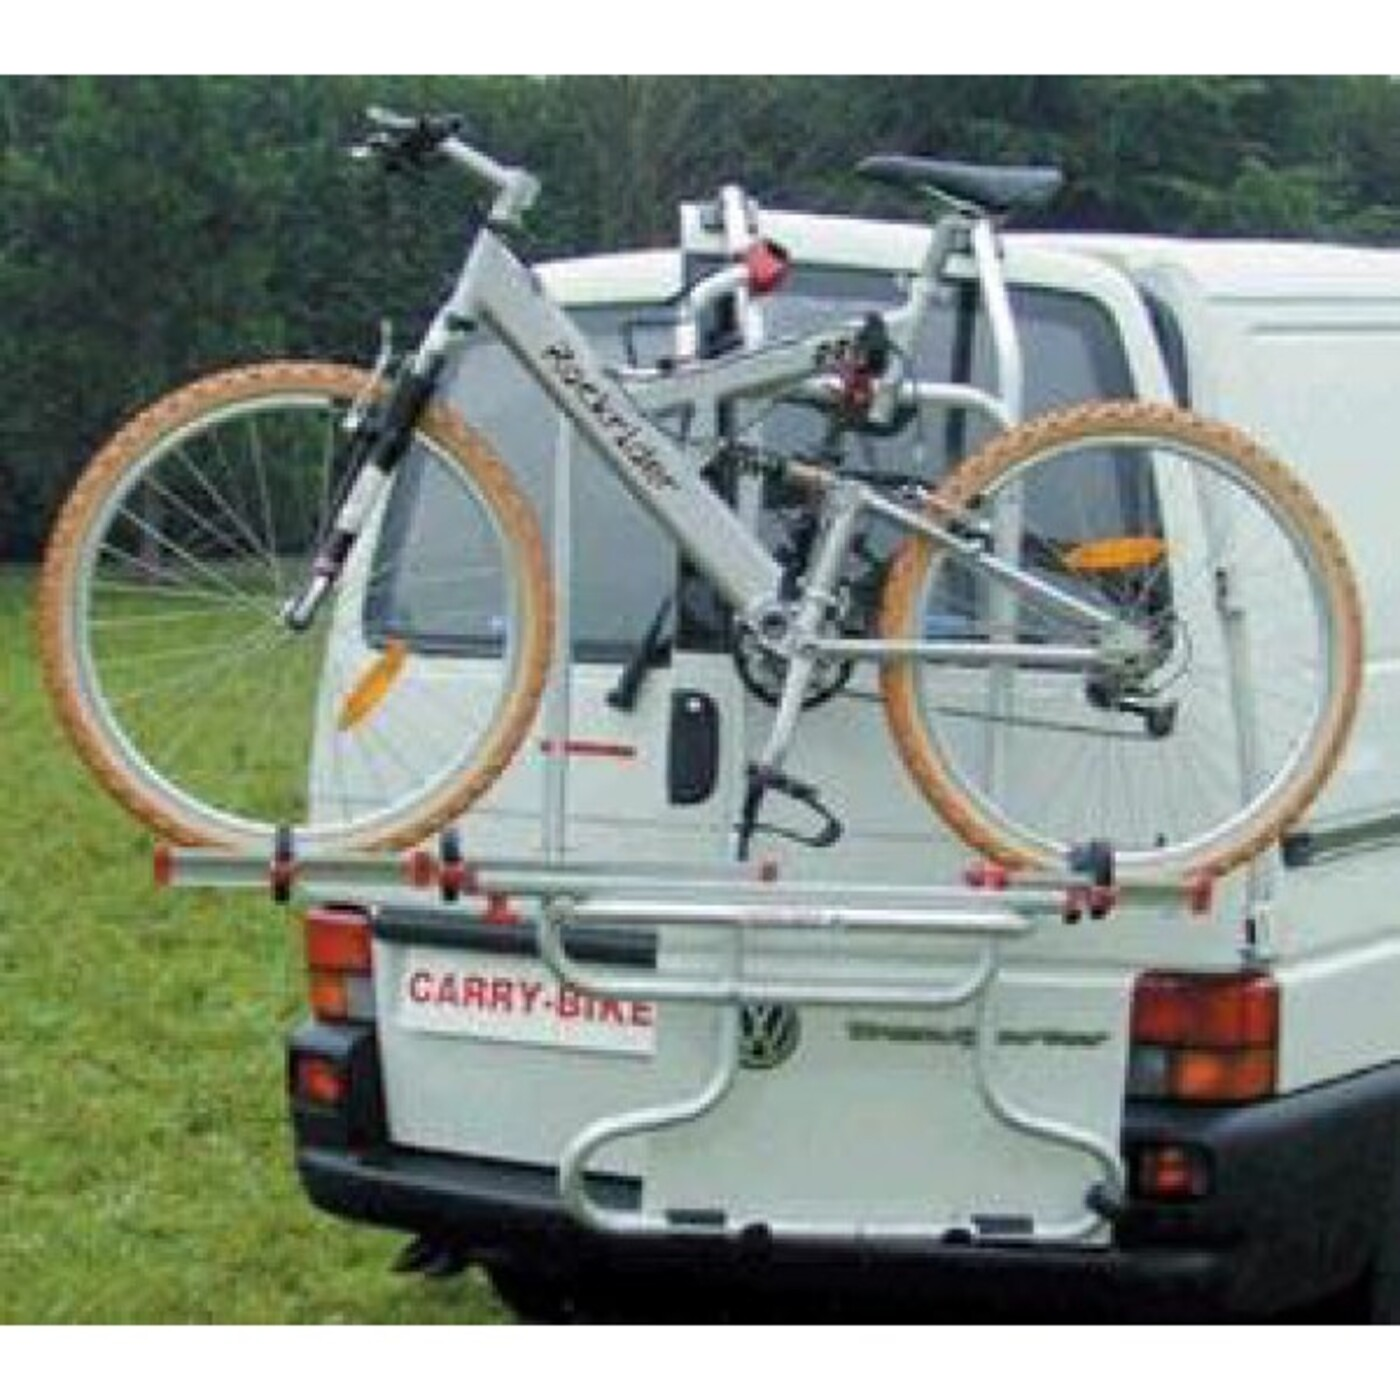 fiamma carry bike vw t4 d homestead caravans. Black Bedroom Furniture Sets. Home Design Ideas